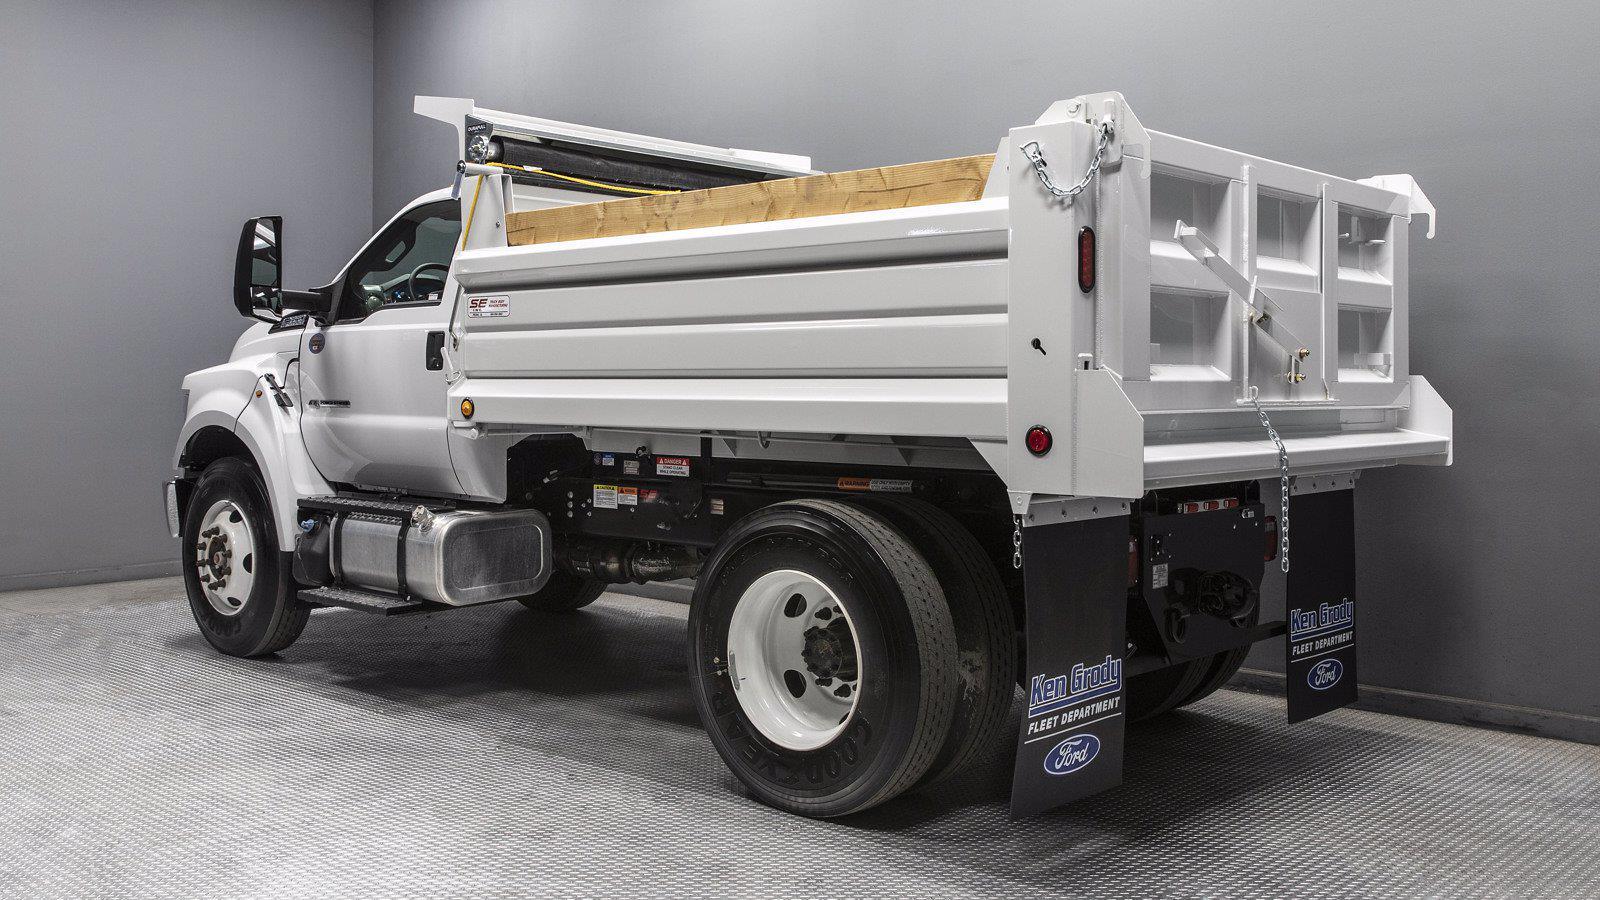 2021 Ford F-650 Regular Cab DRW 4x2, Scelzi Dump Body #211047 - photo 1